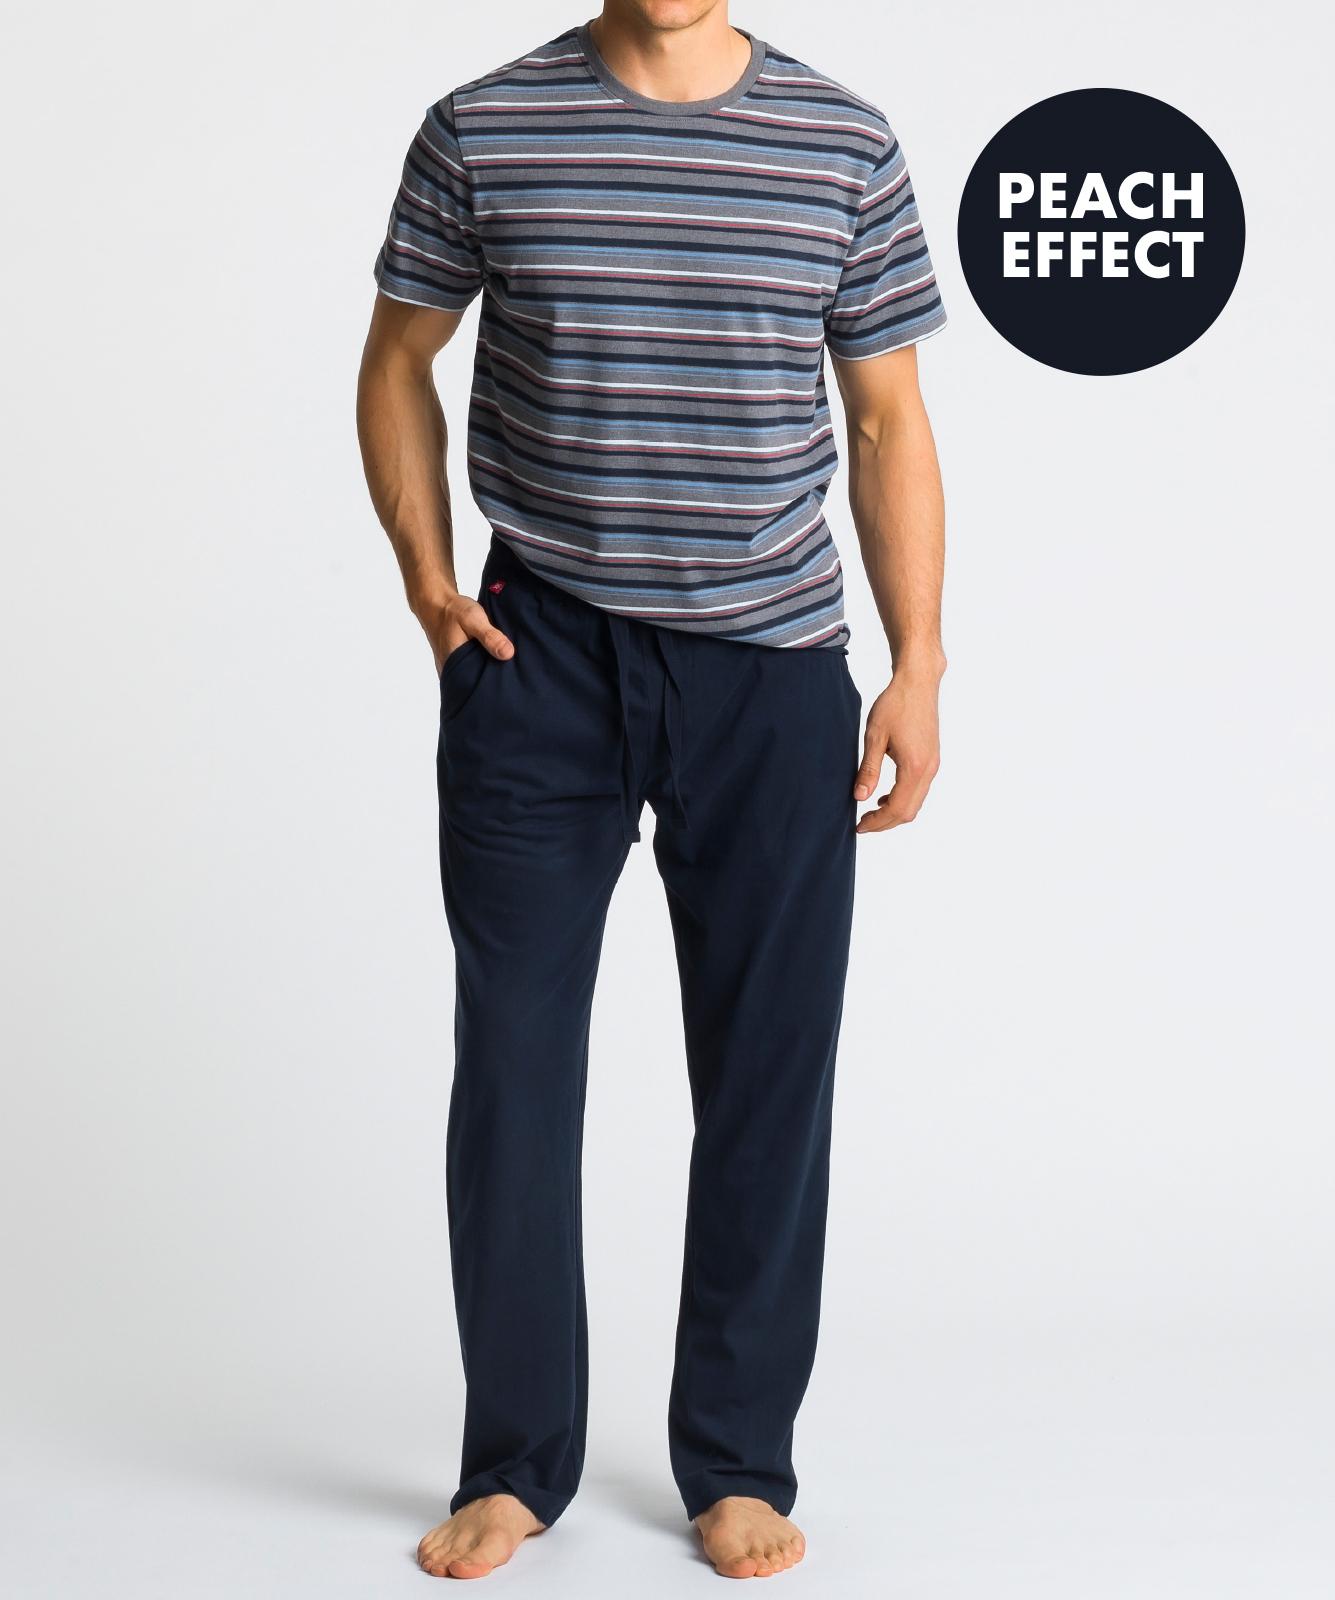 Мужская пижама Atlantic, 1 шт. в уп., хлопок, серый меланж, NMP-345